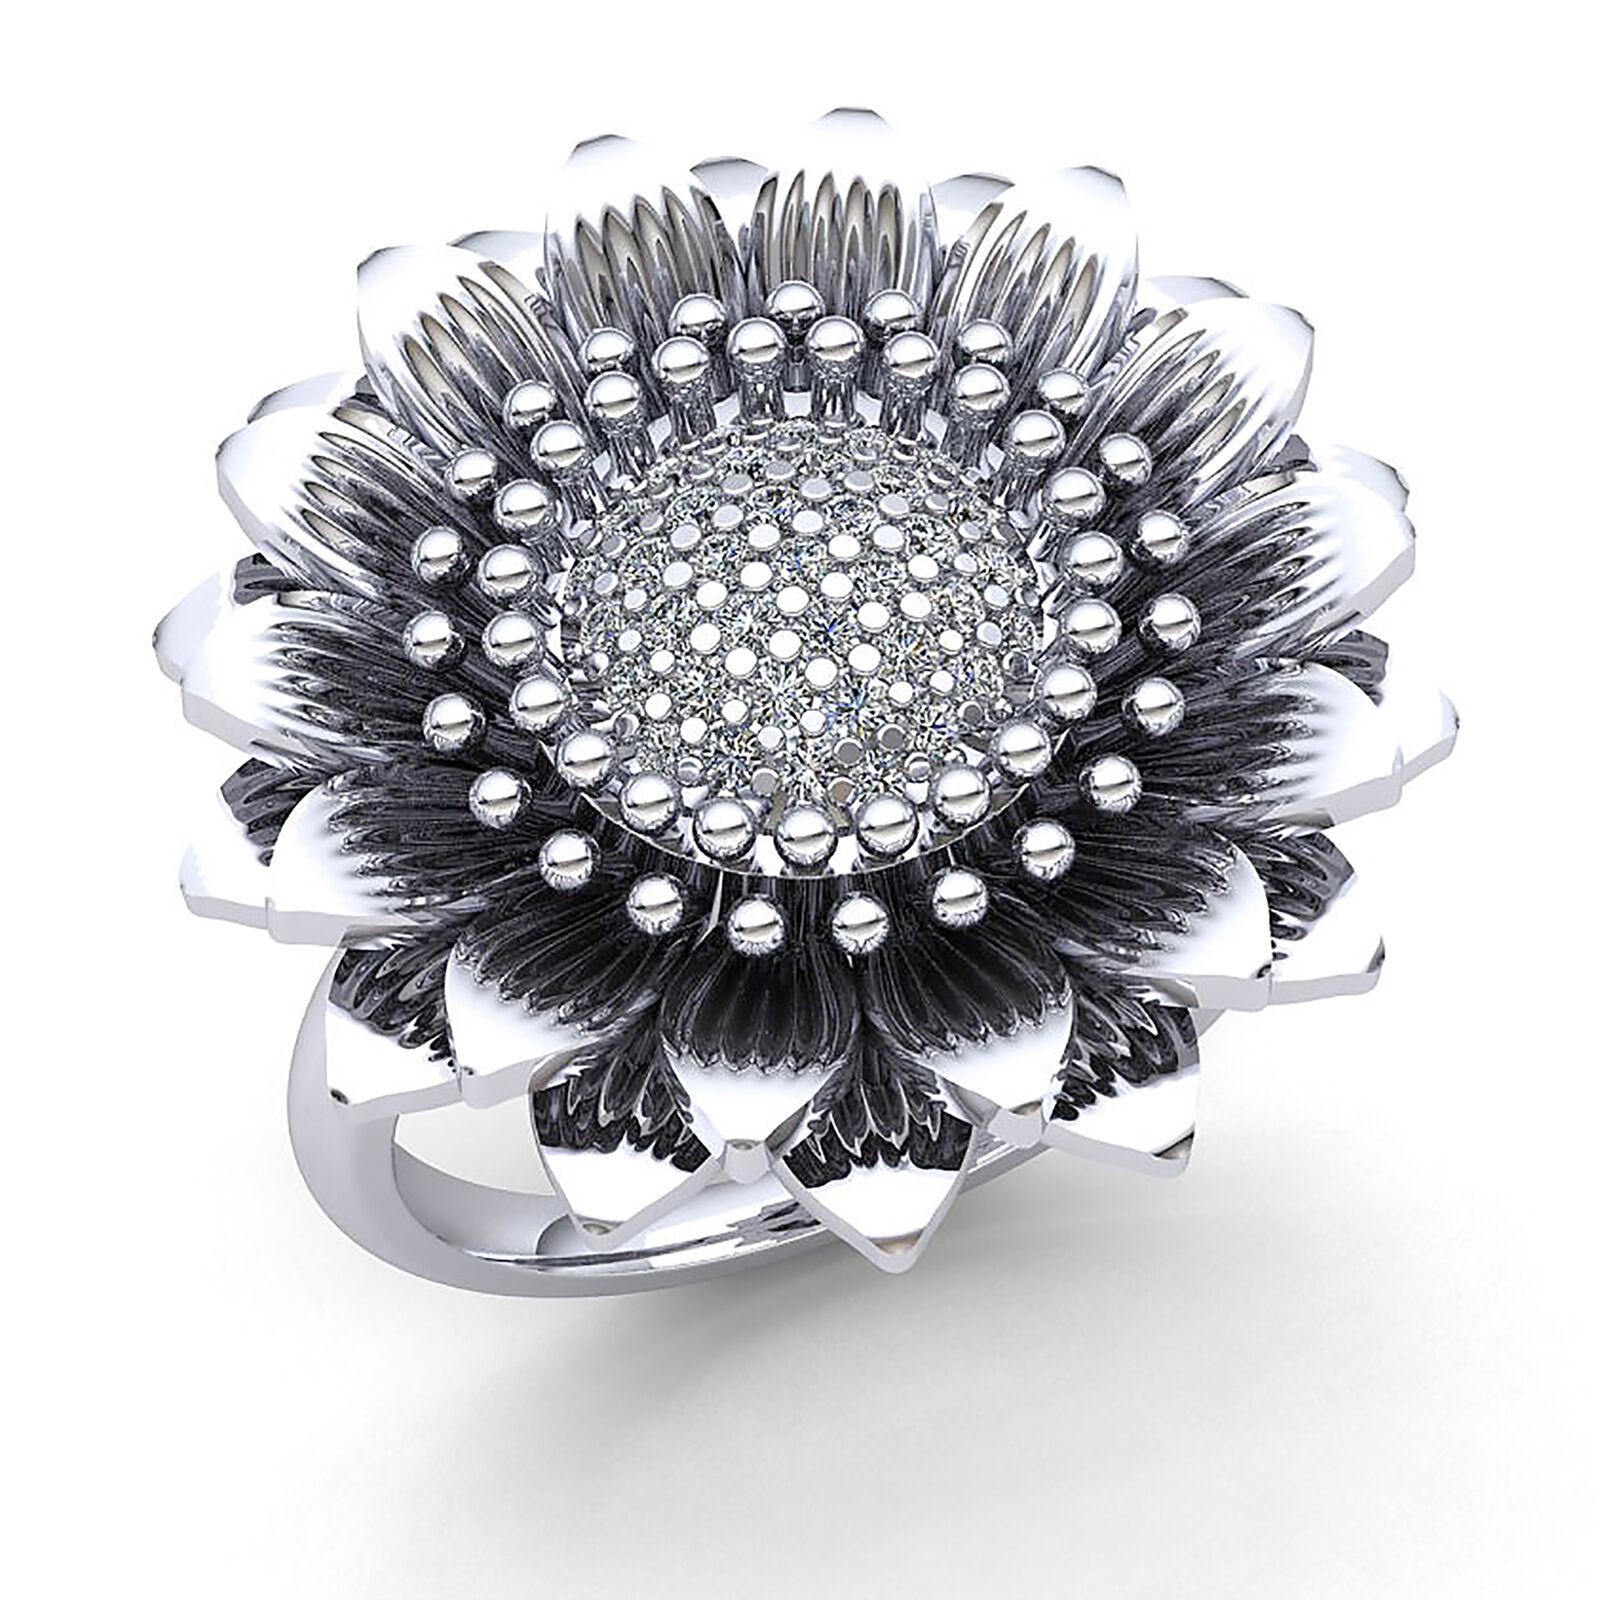 2ct Round Cut Diamond Ladies Flower Vintage Anniversary Engagement Ring 14K gold